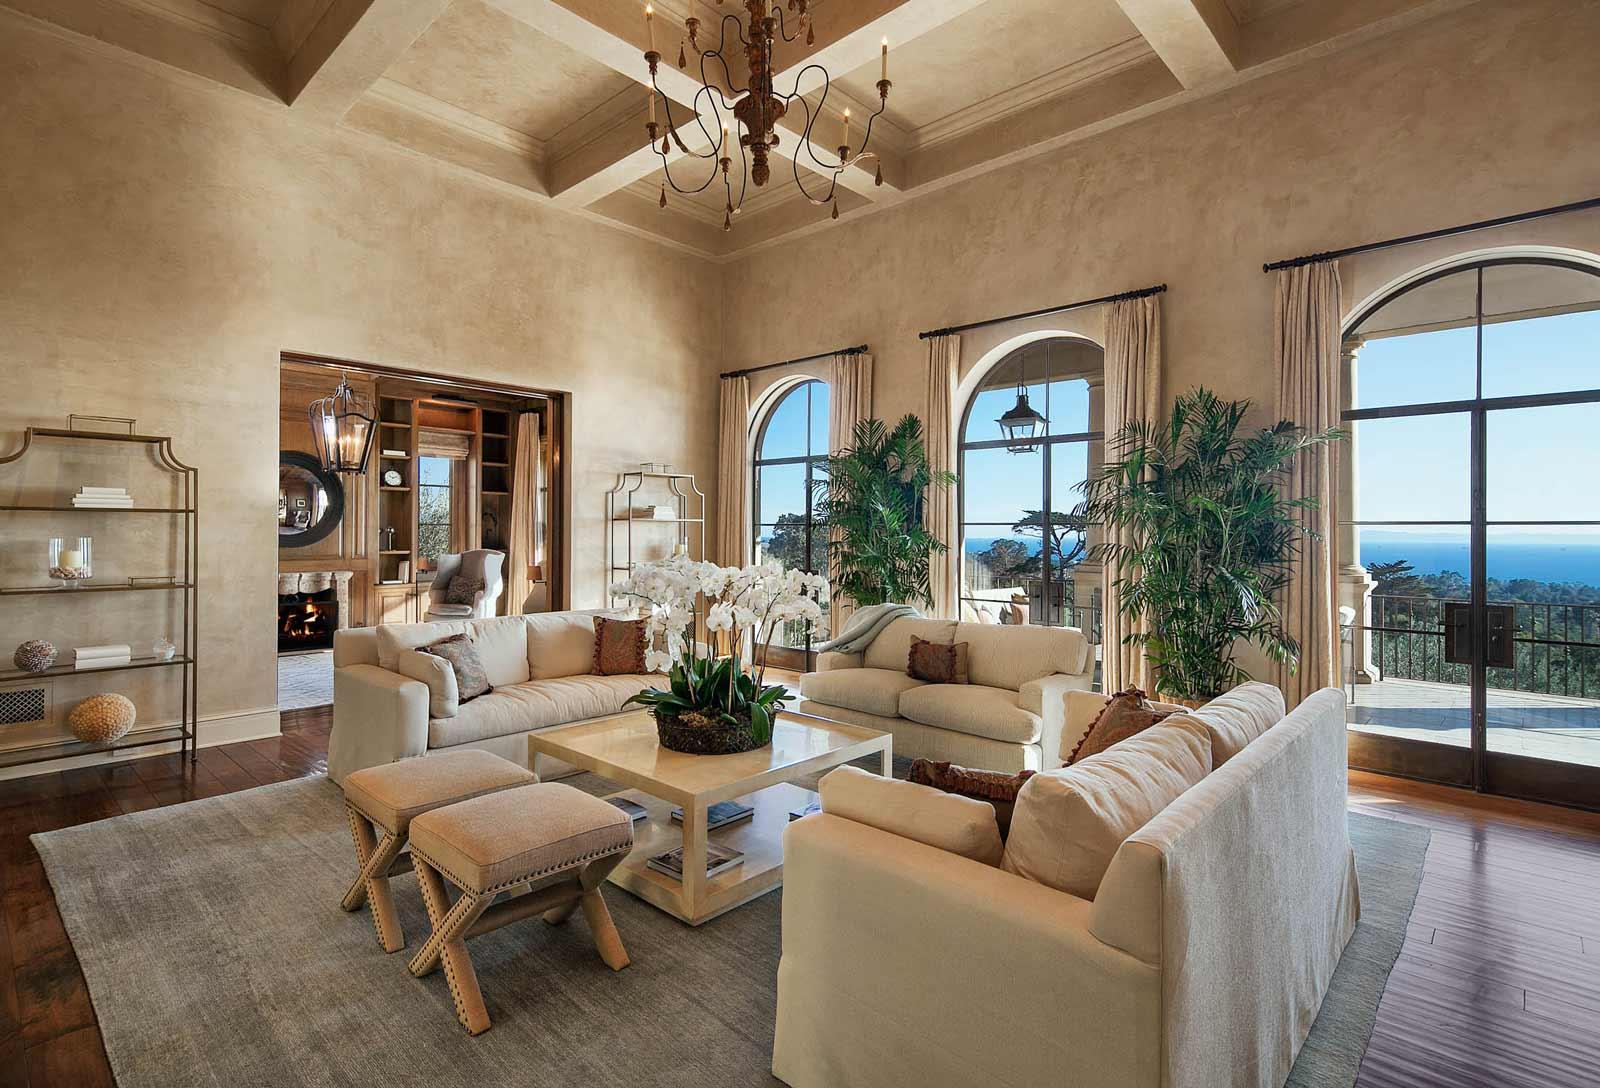 https://i0.wp.com/mhedesigns.com/wp-content/uploads/2016/07/tuscan-style-living-room.jpg?ssl=1